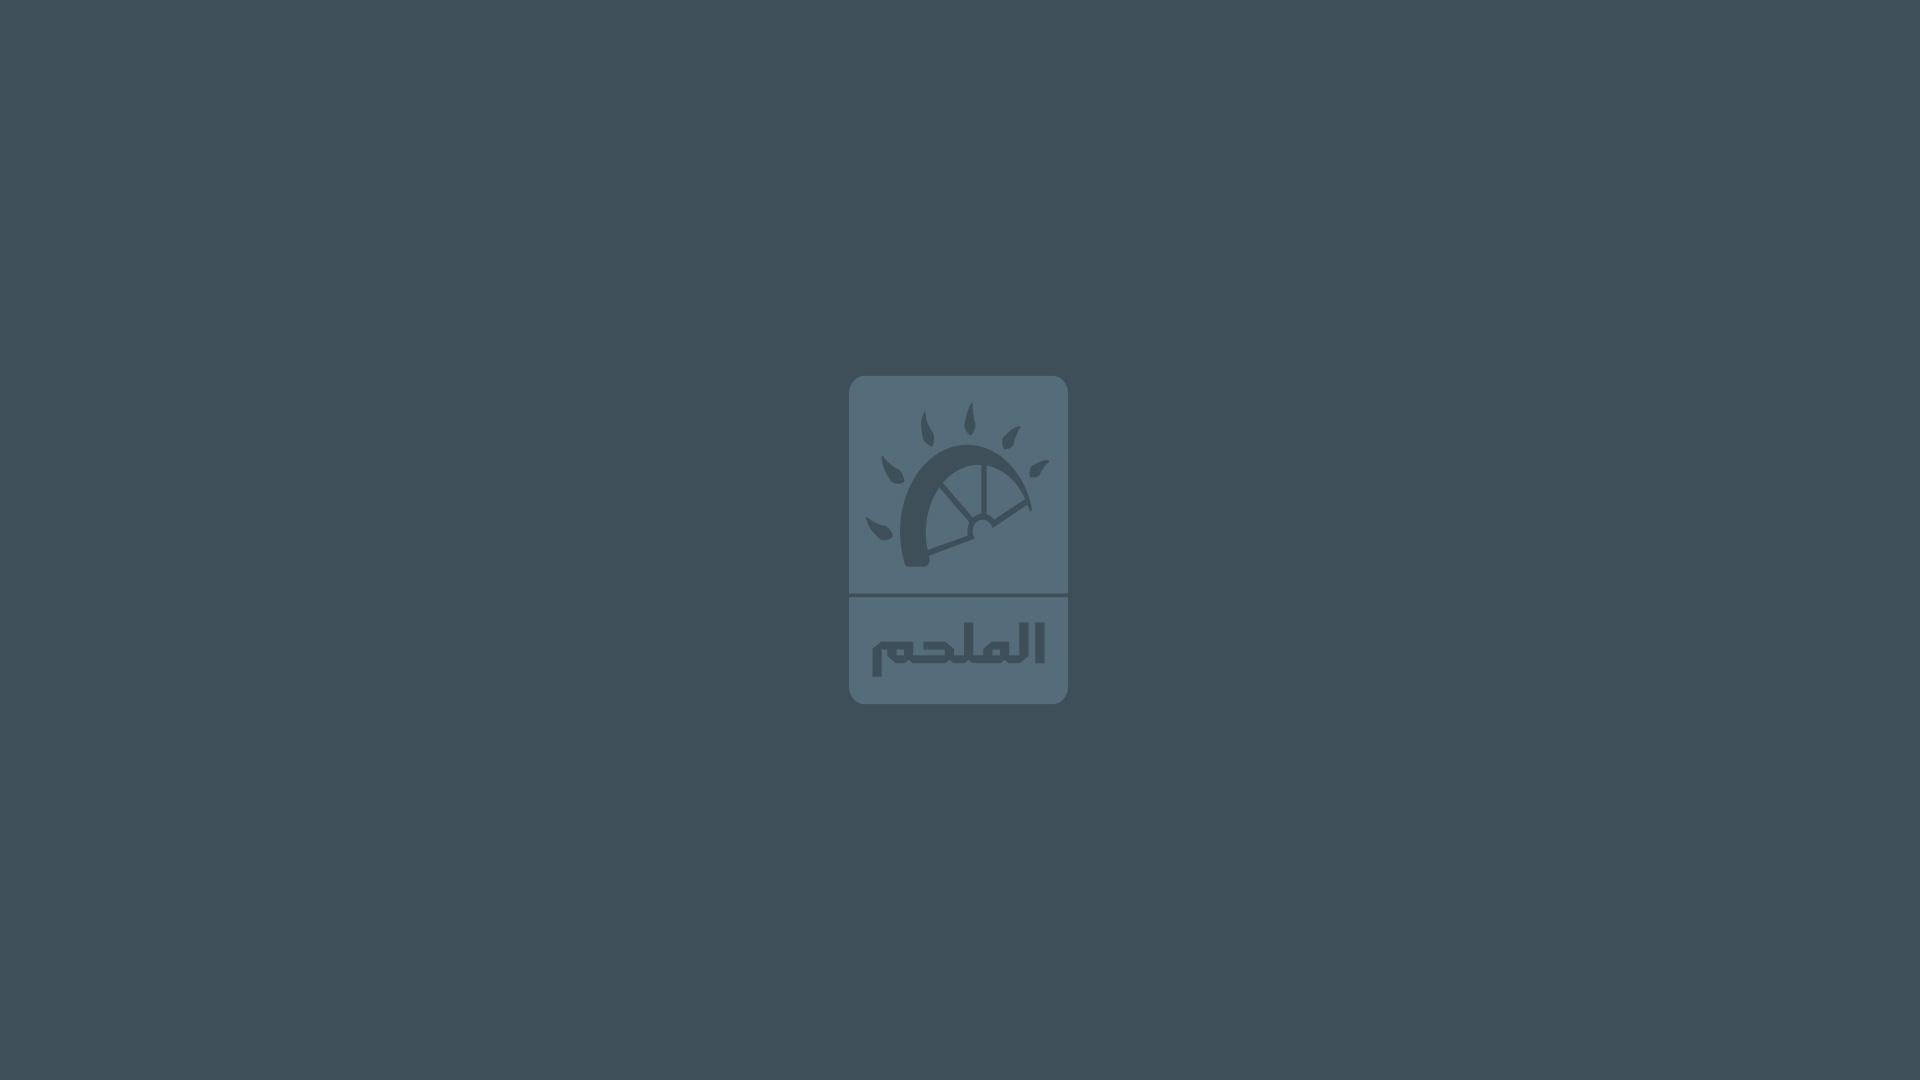 placeholder-1920x1080.jpg